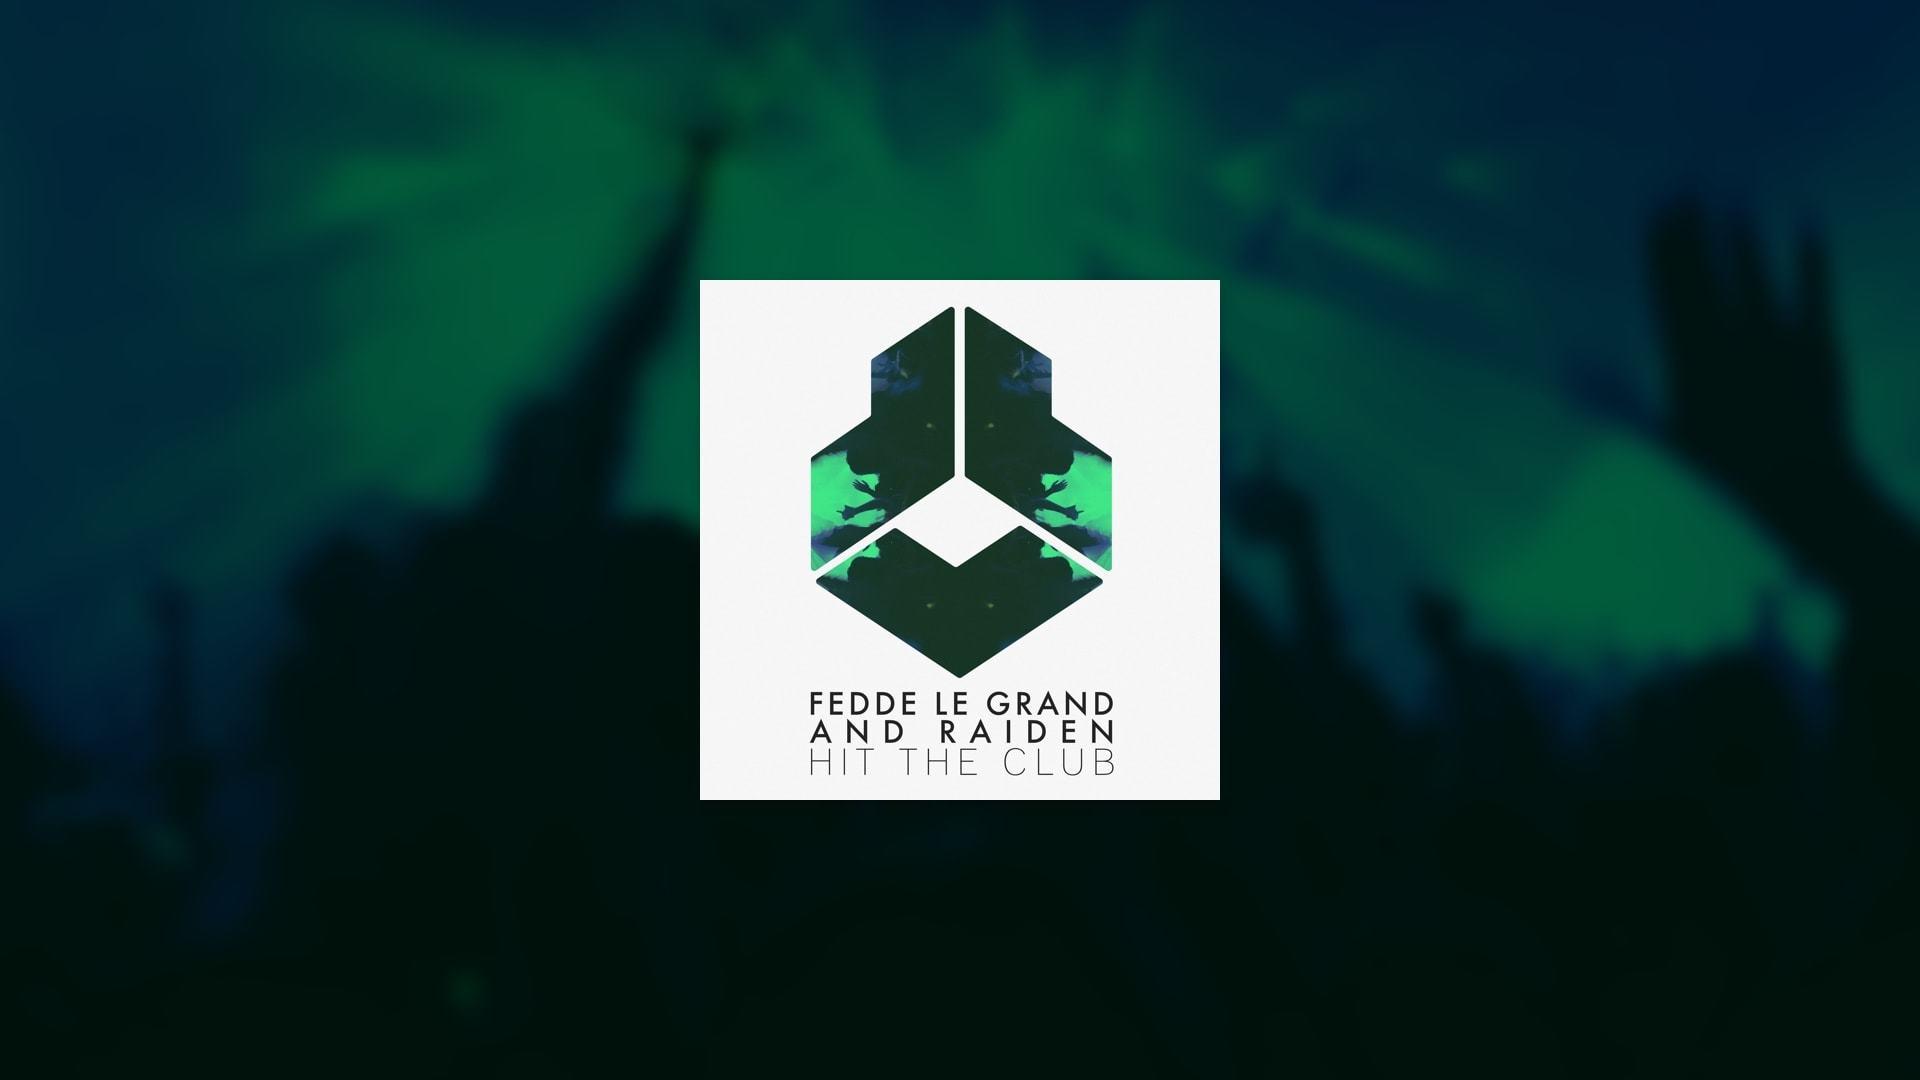 Fedde Le Grand & Raiden - Hit The Club ile ilgili görsel sonucu